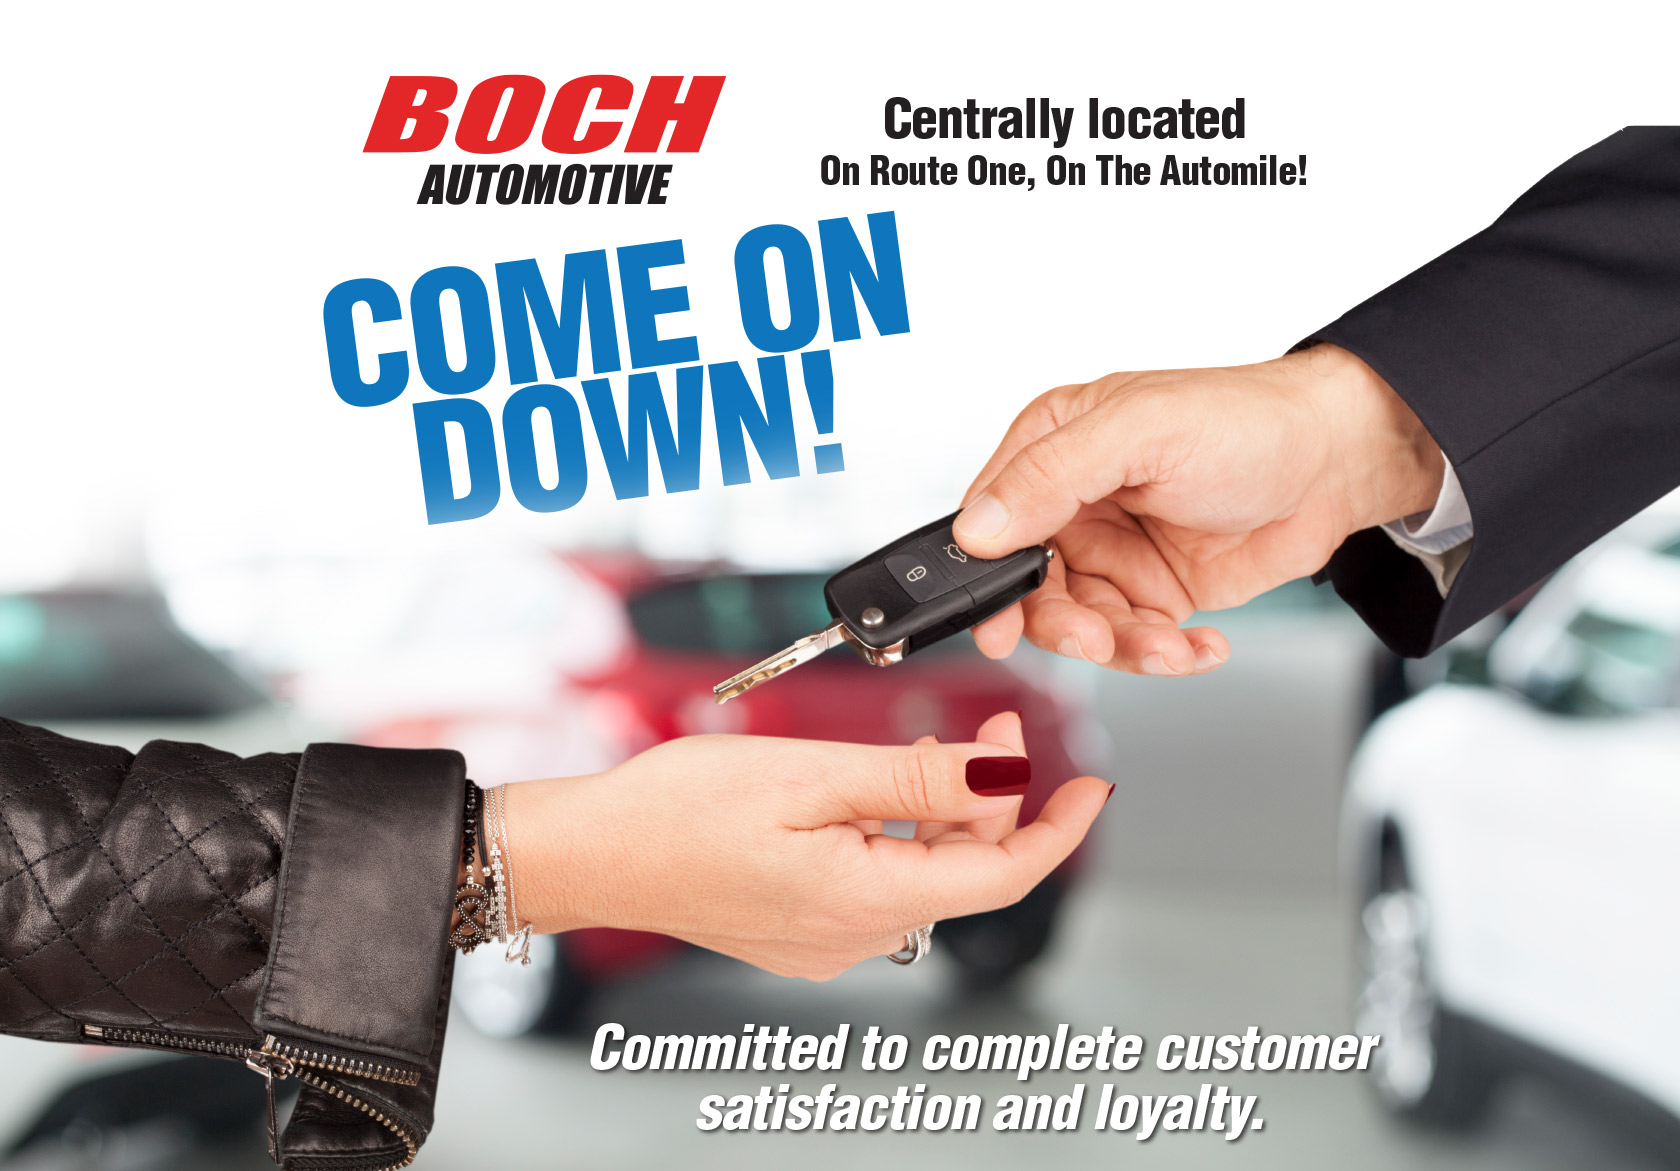 Why Buy Boch